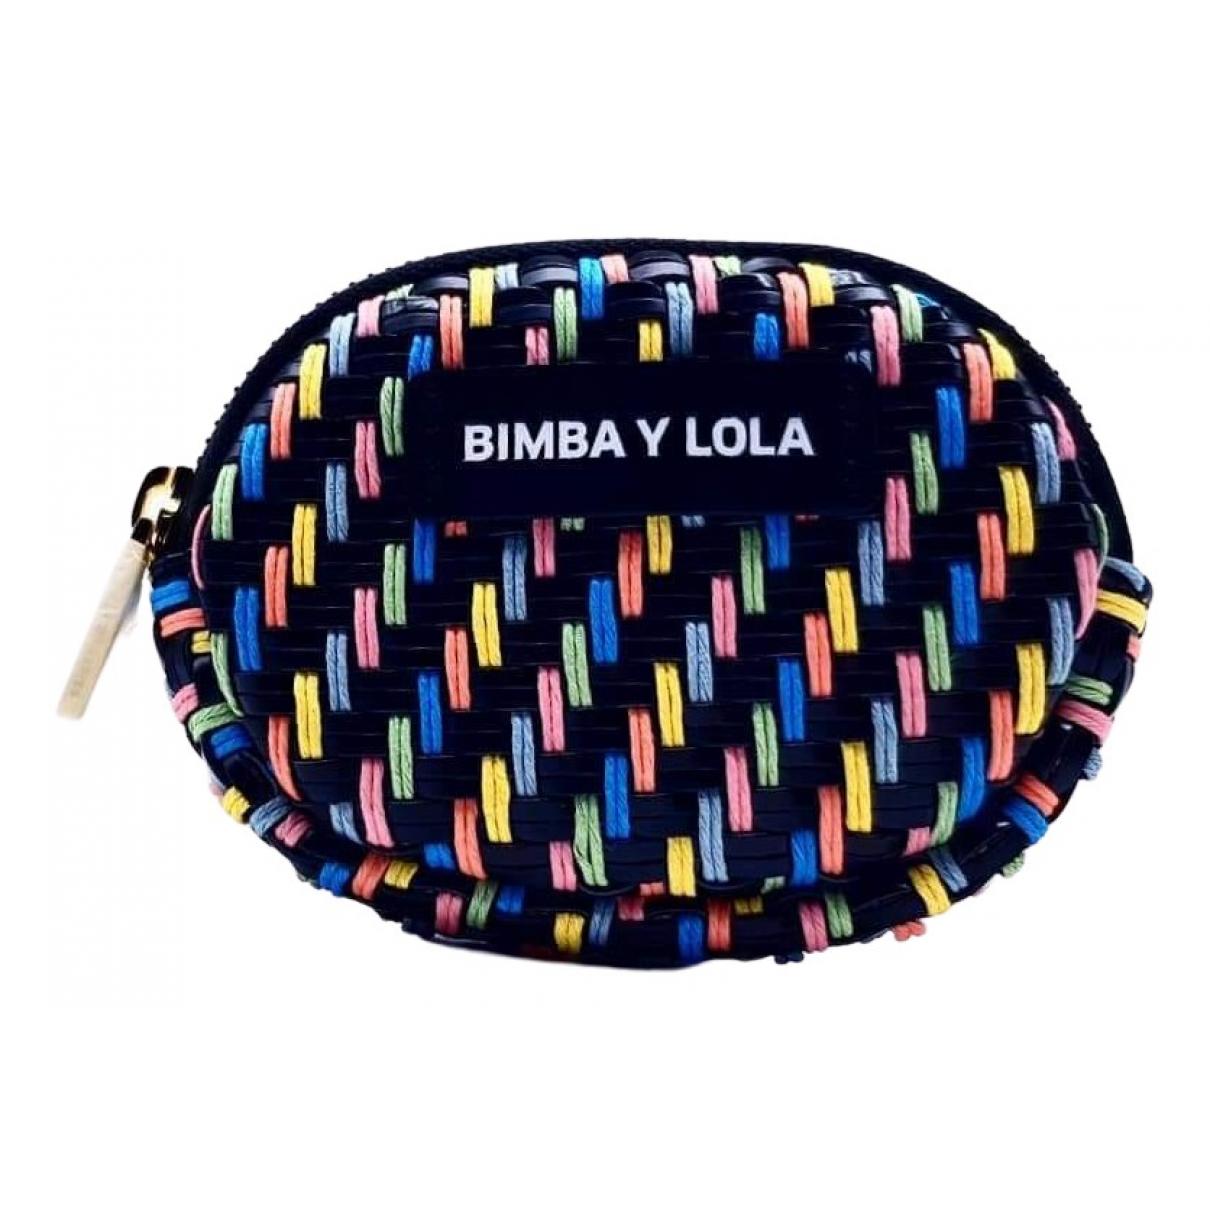 Bimba Y Lola - Petite maroquinerie   pour femme - multicolore